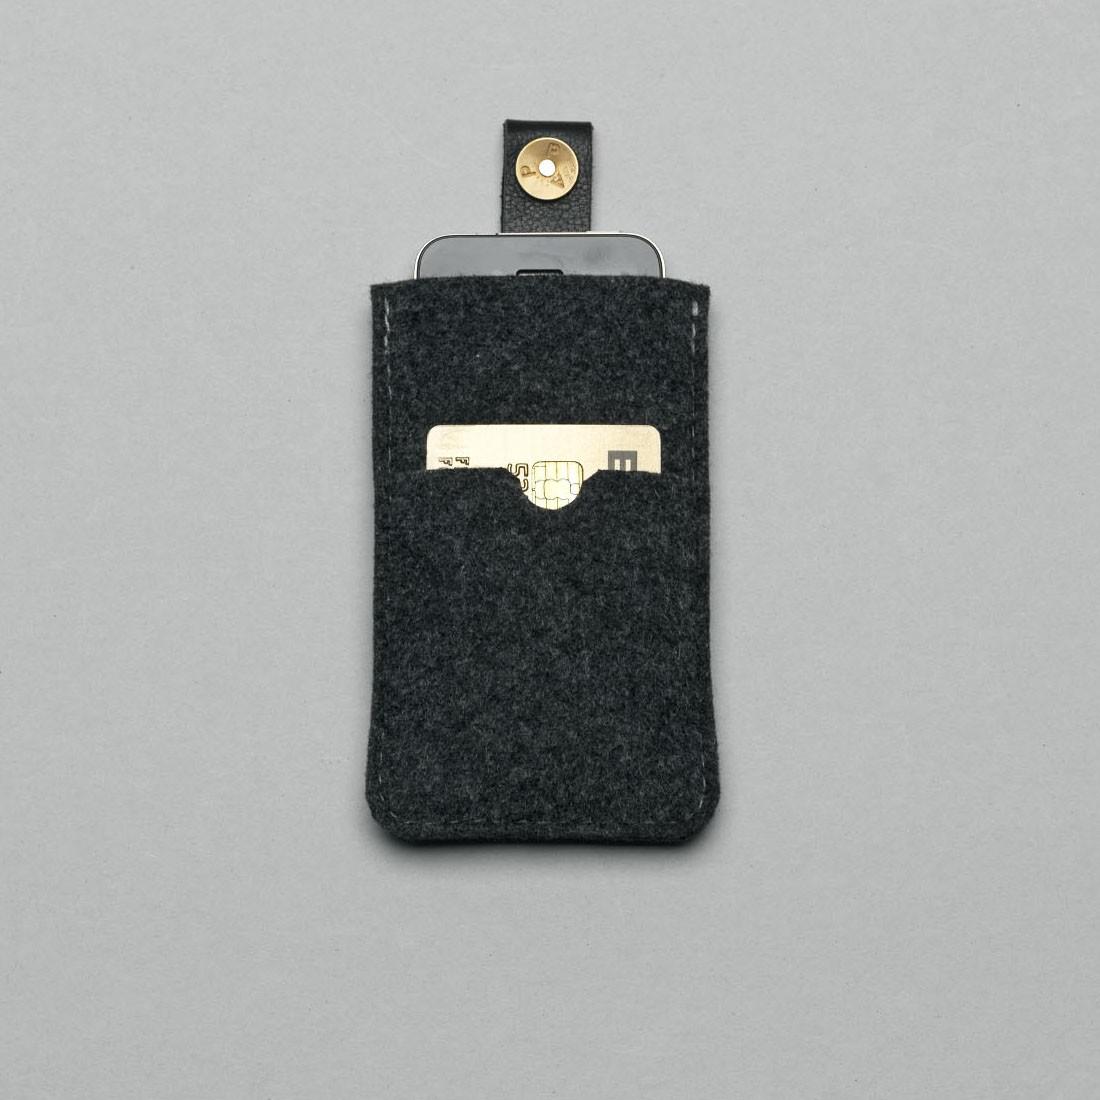 P.A.P Filt Etui m/ Kortholder & Neckband til Bl.a. iPhone - Mørke Grå